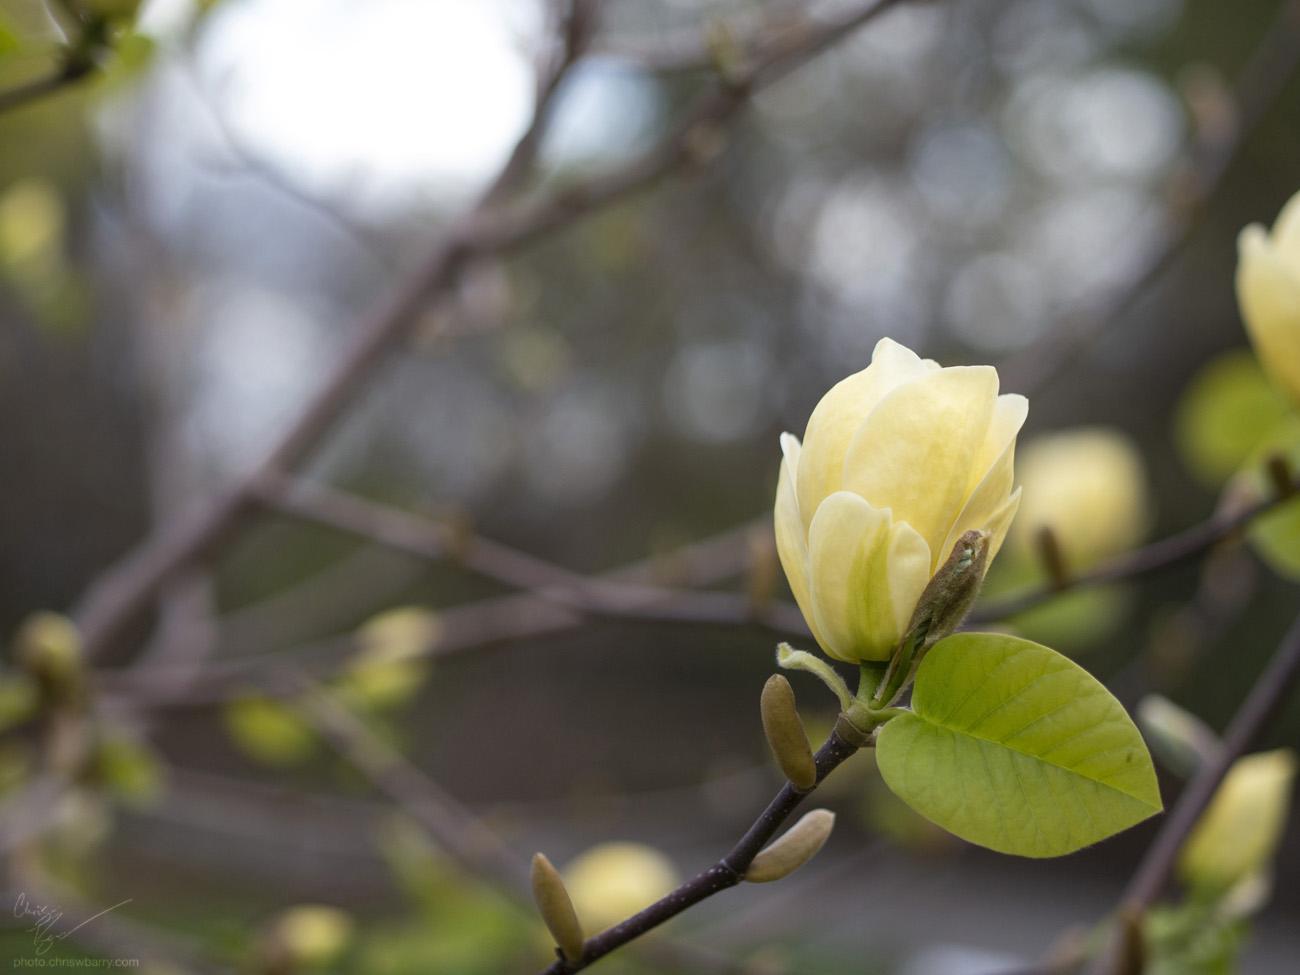 4-29-18: Yellow Bird Magnolia